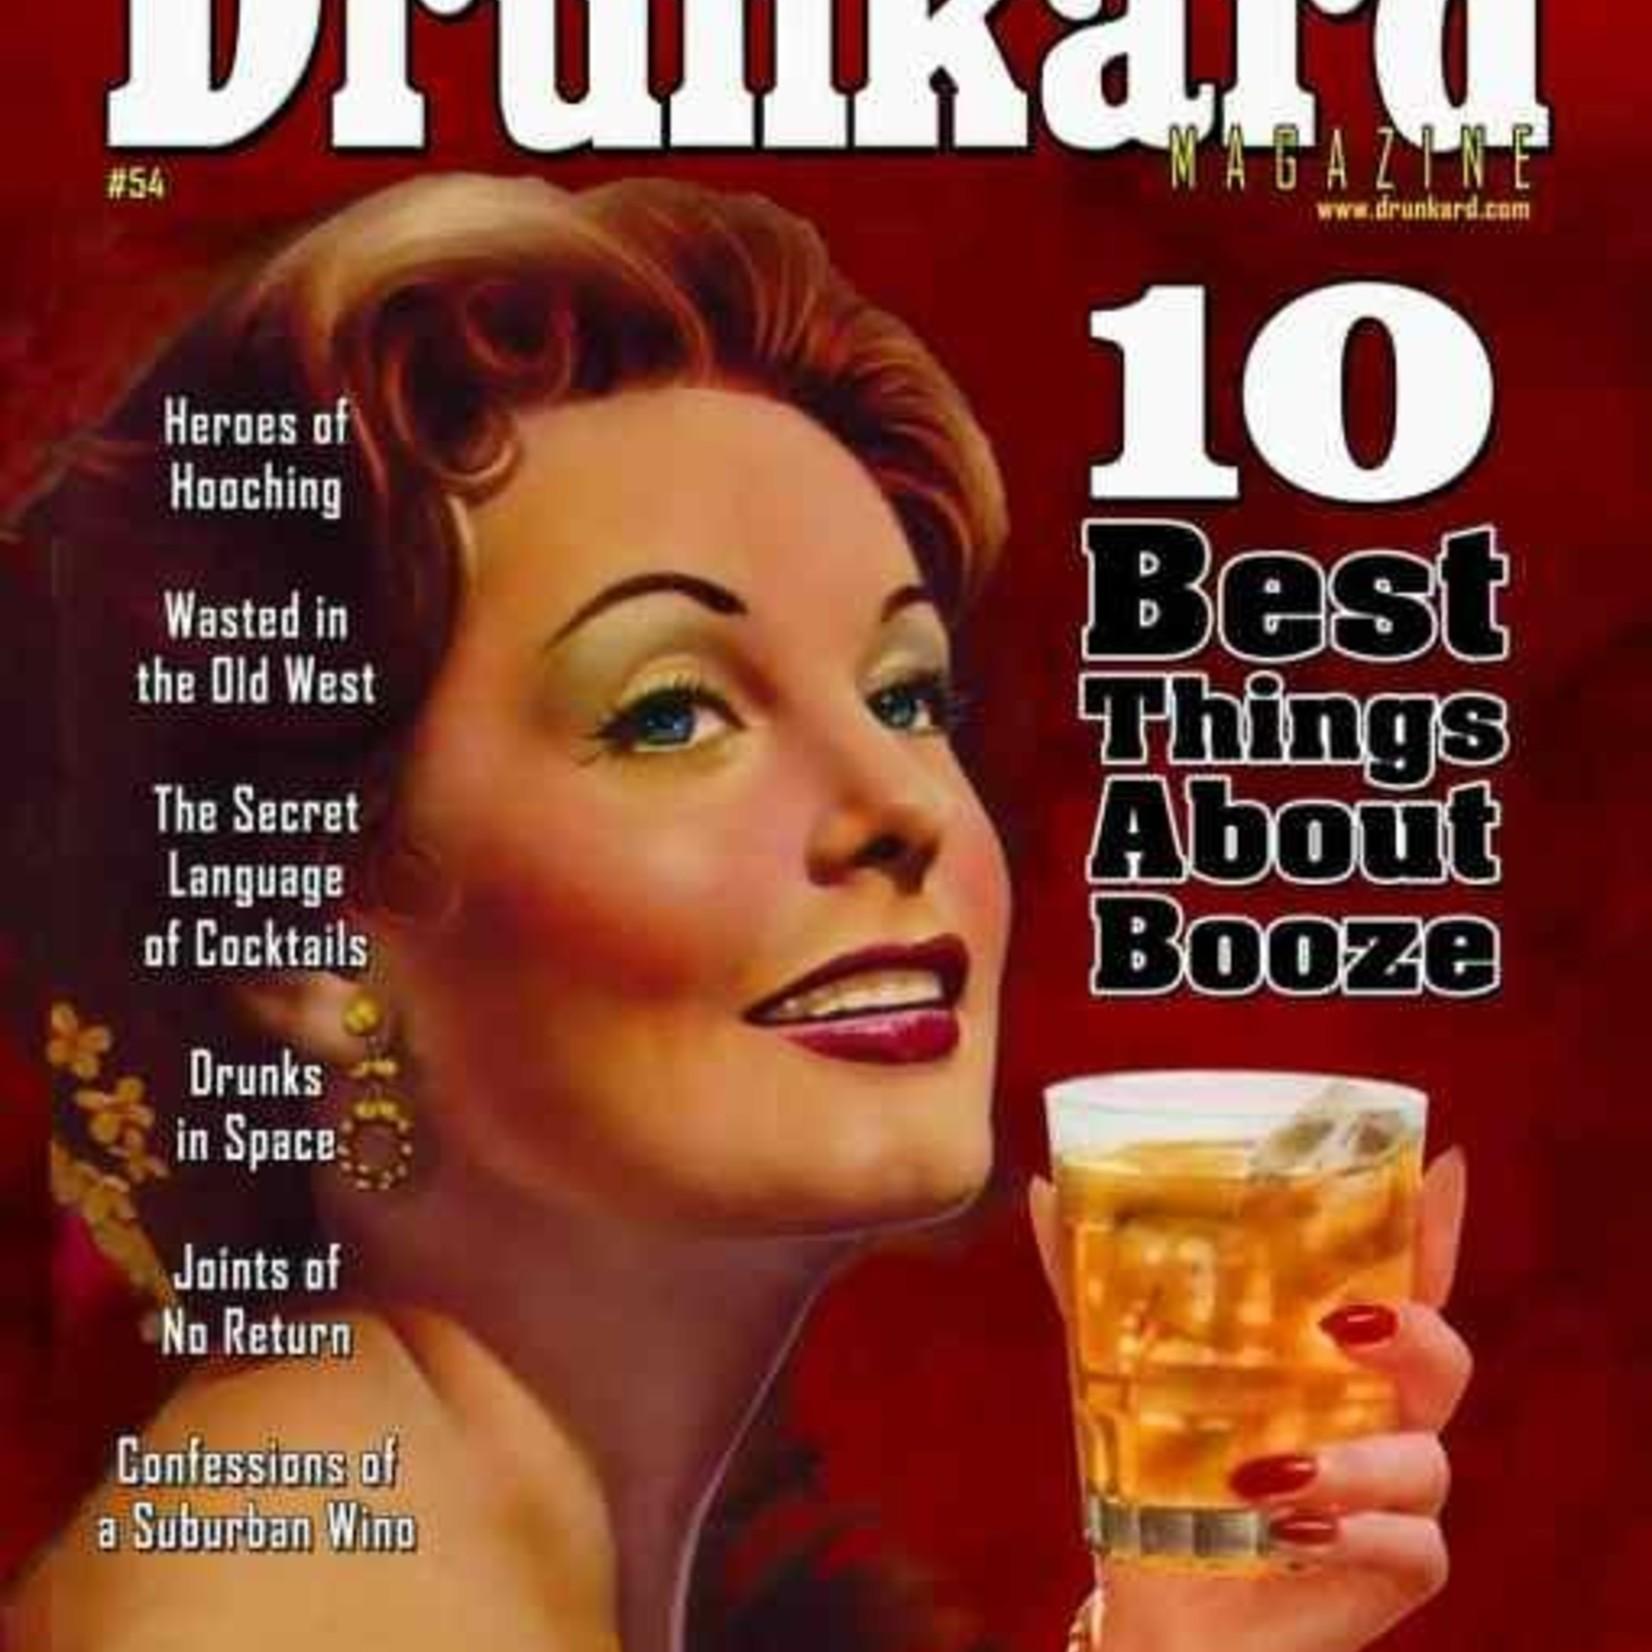 Modern Drunkard Modern Drunkard Magazine